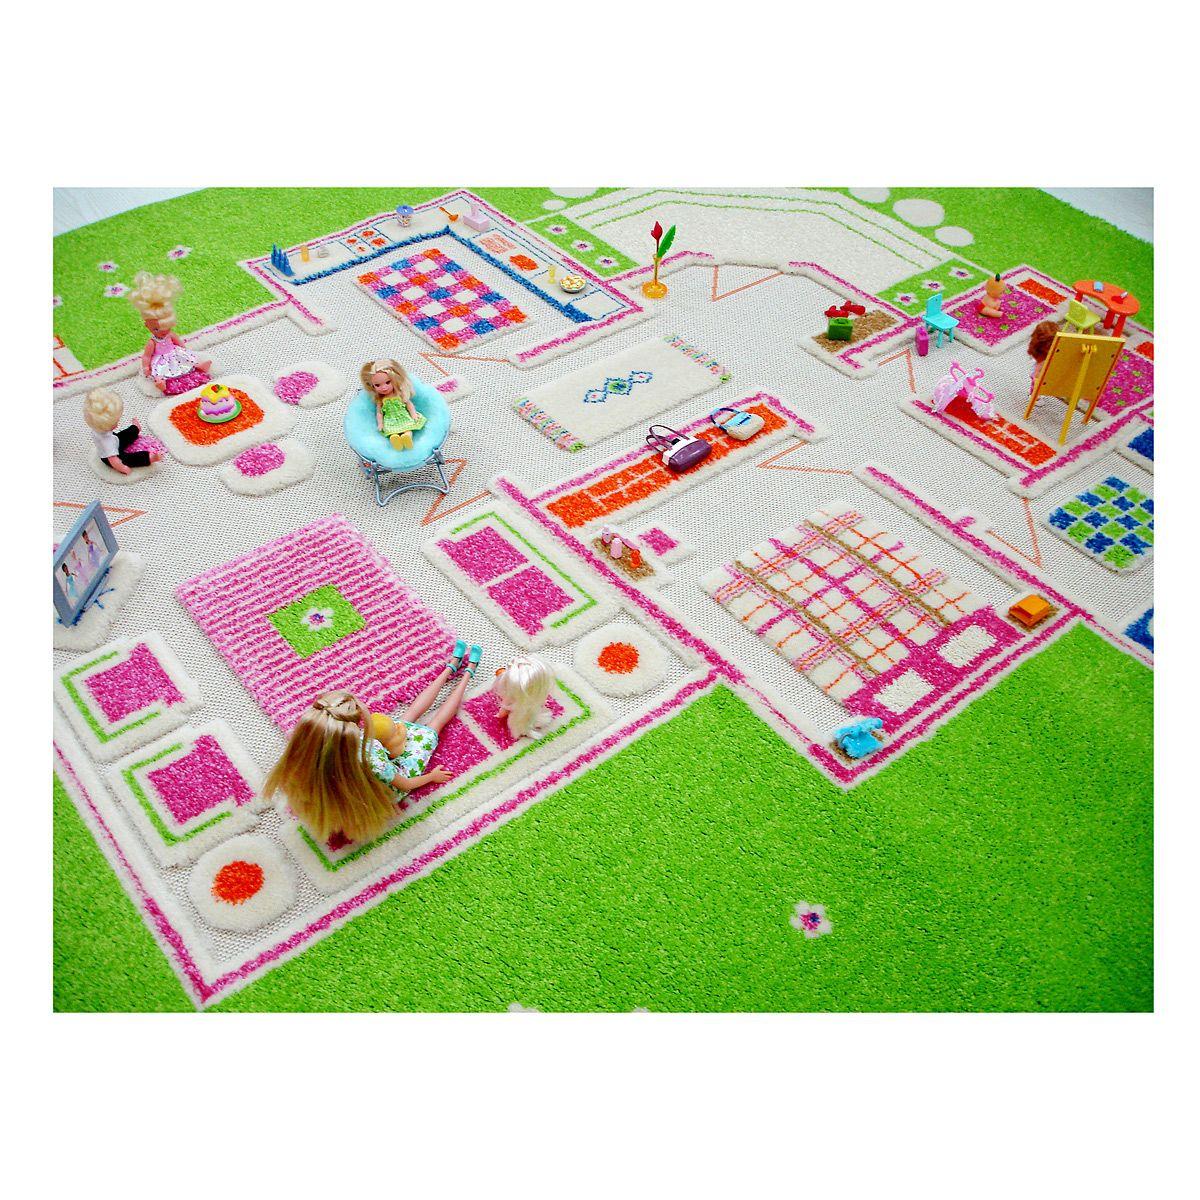 Playhouse 3d Carpets Play Rug Toy Creative